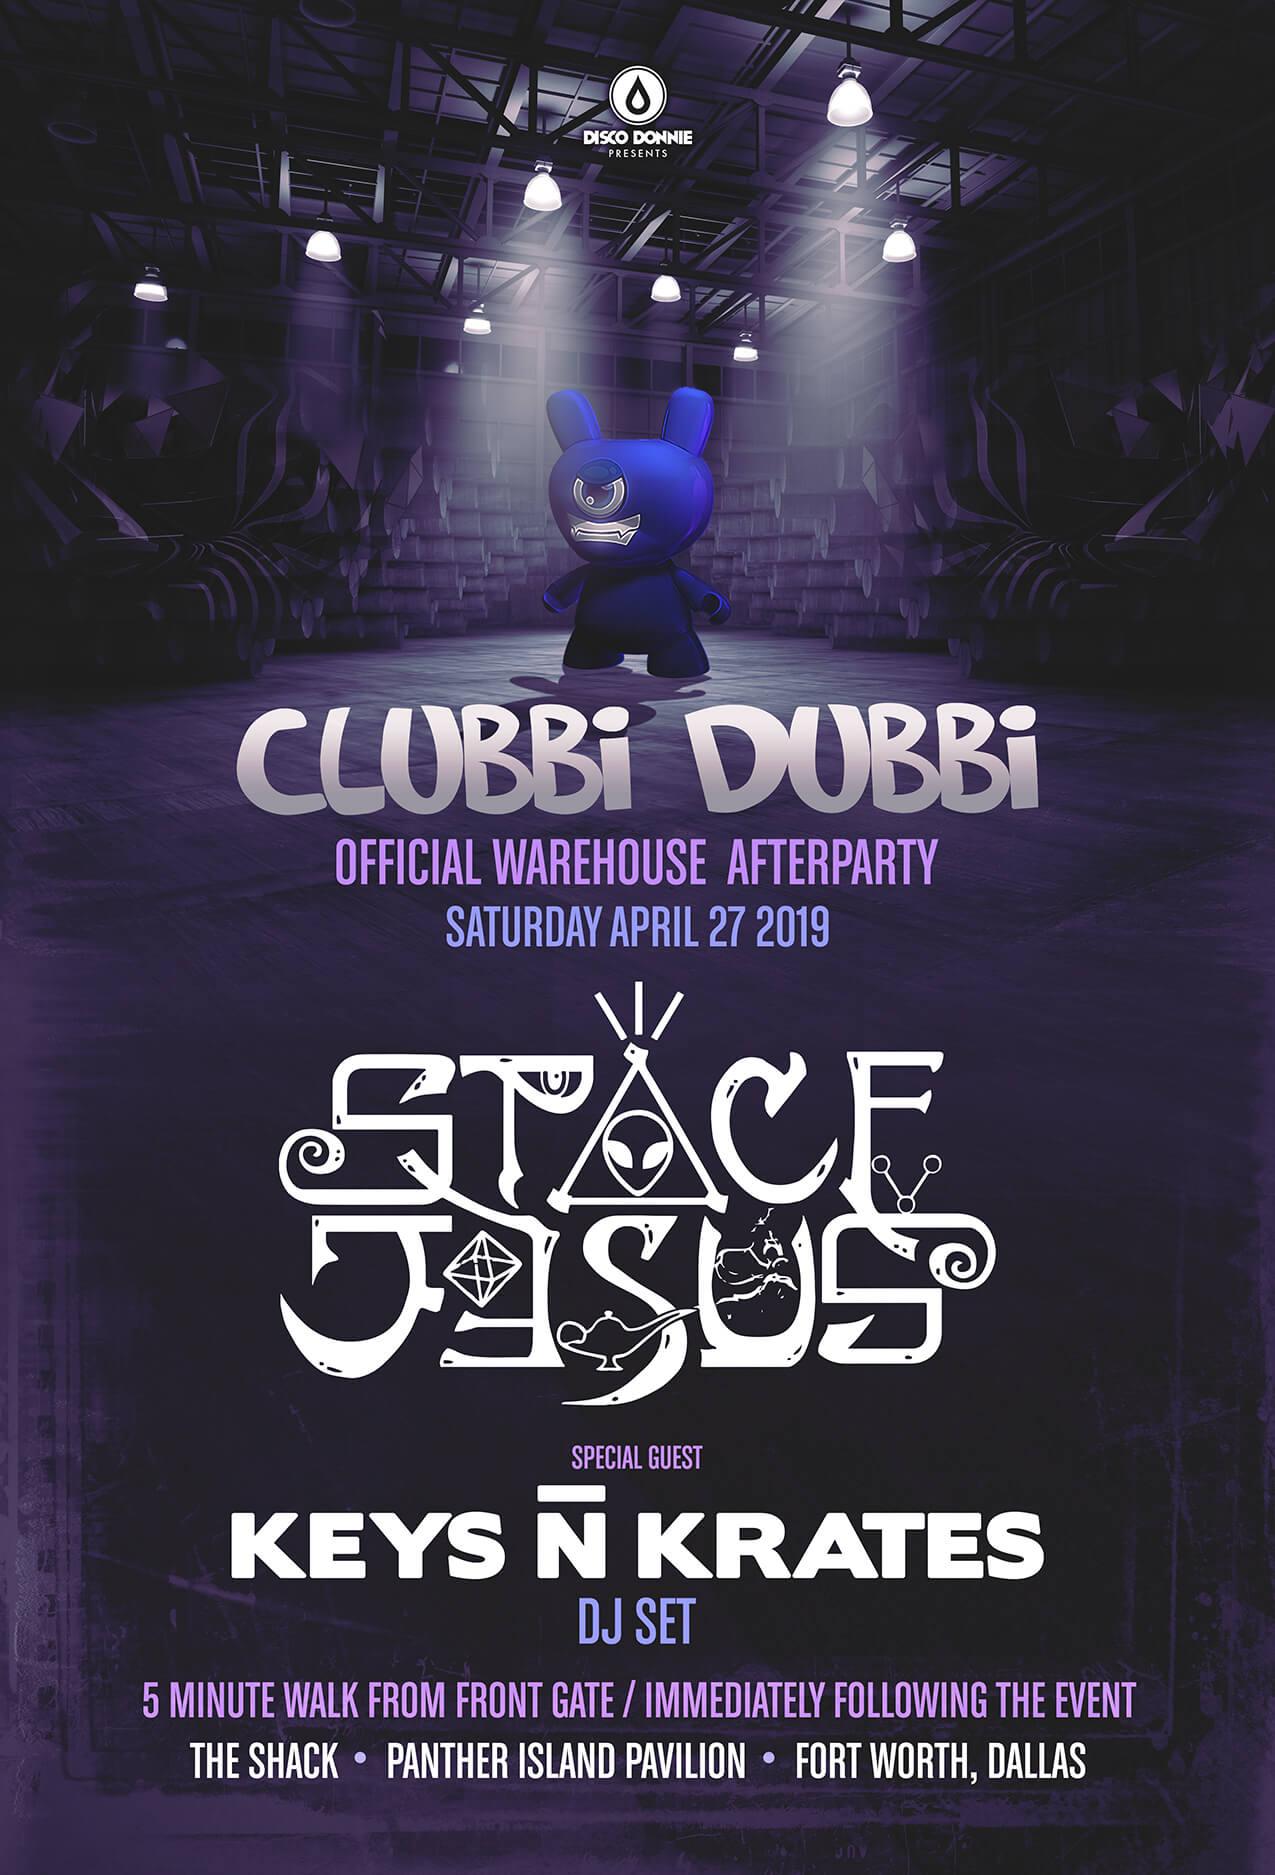 Space Jesus, Keys N Krates at The Shack (Panther Island